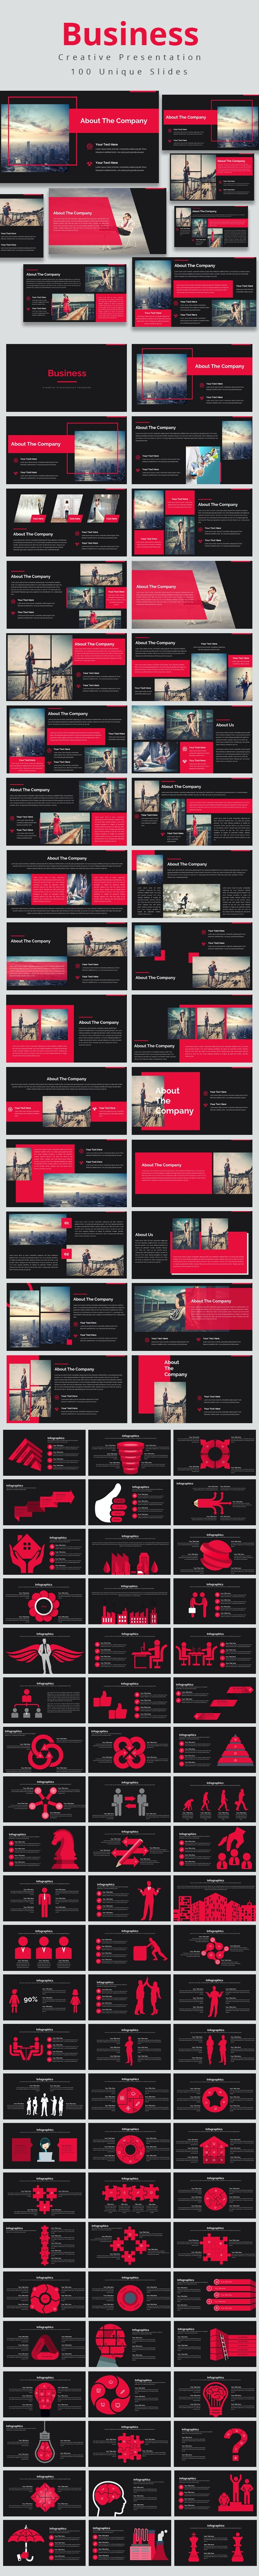 Business Multi-purpose Keynote Presentation Template - Business Keynote Templates